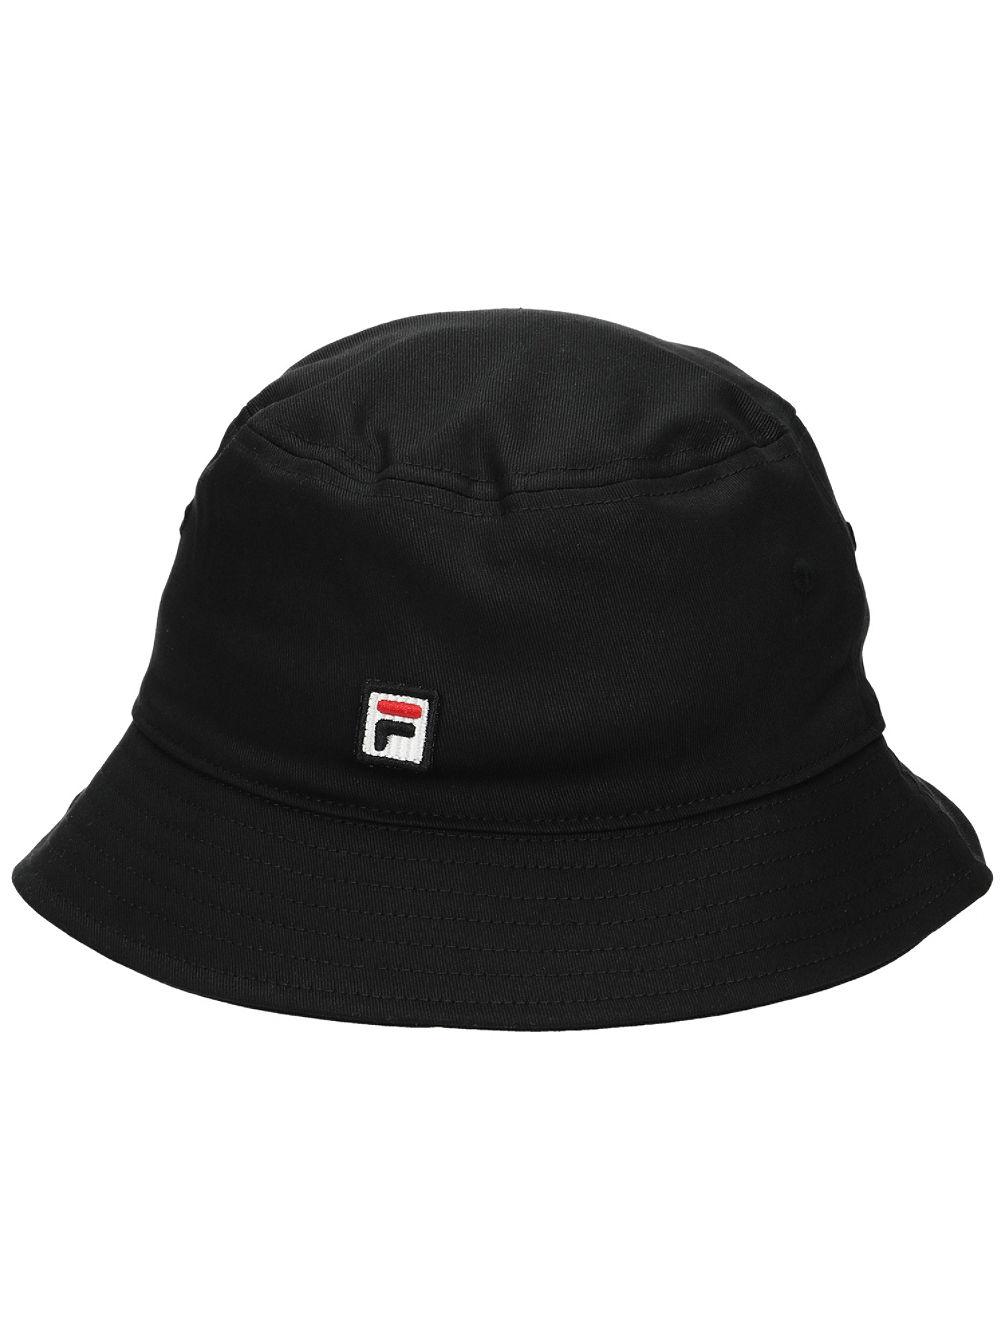 578ddd8509 Buy Fila Bucket Cap online at Blue Tomato